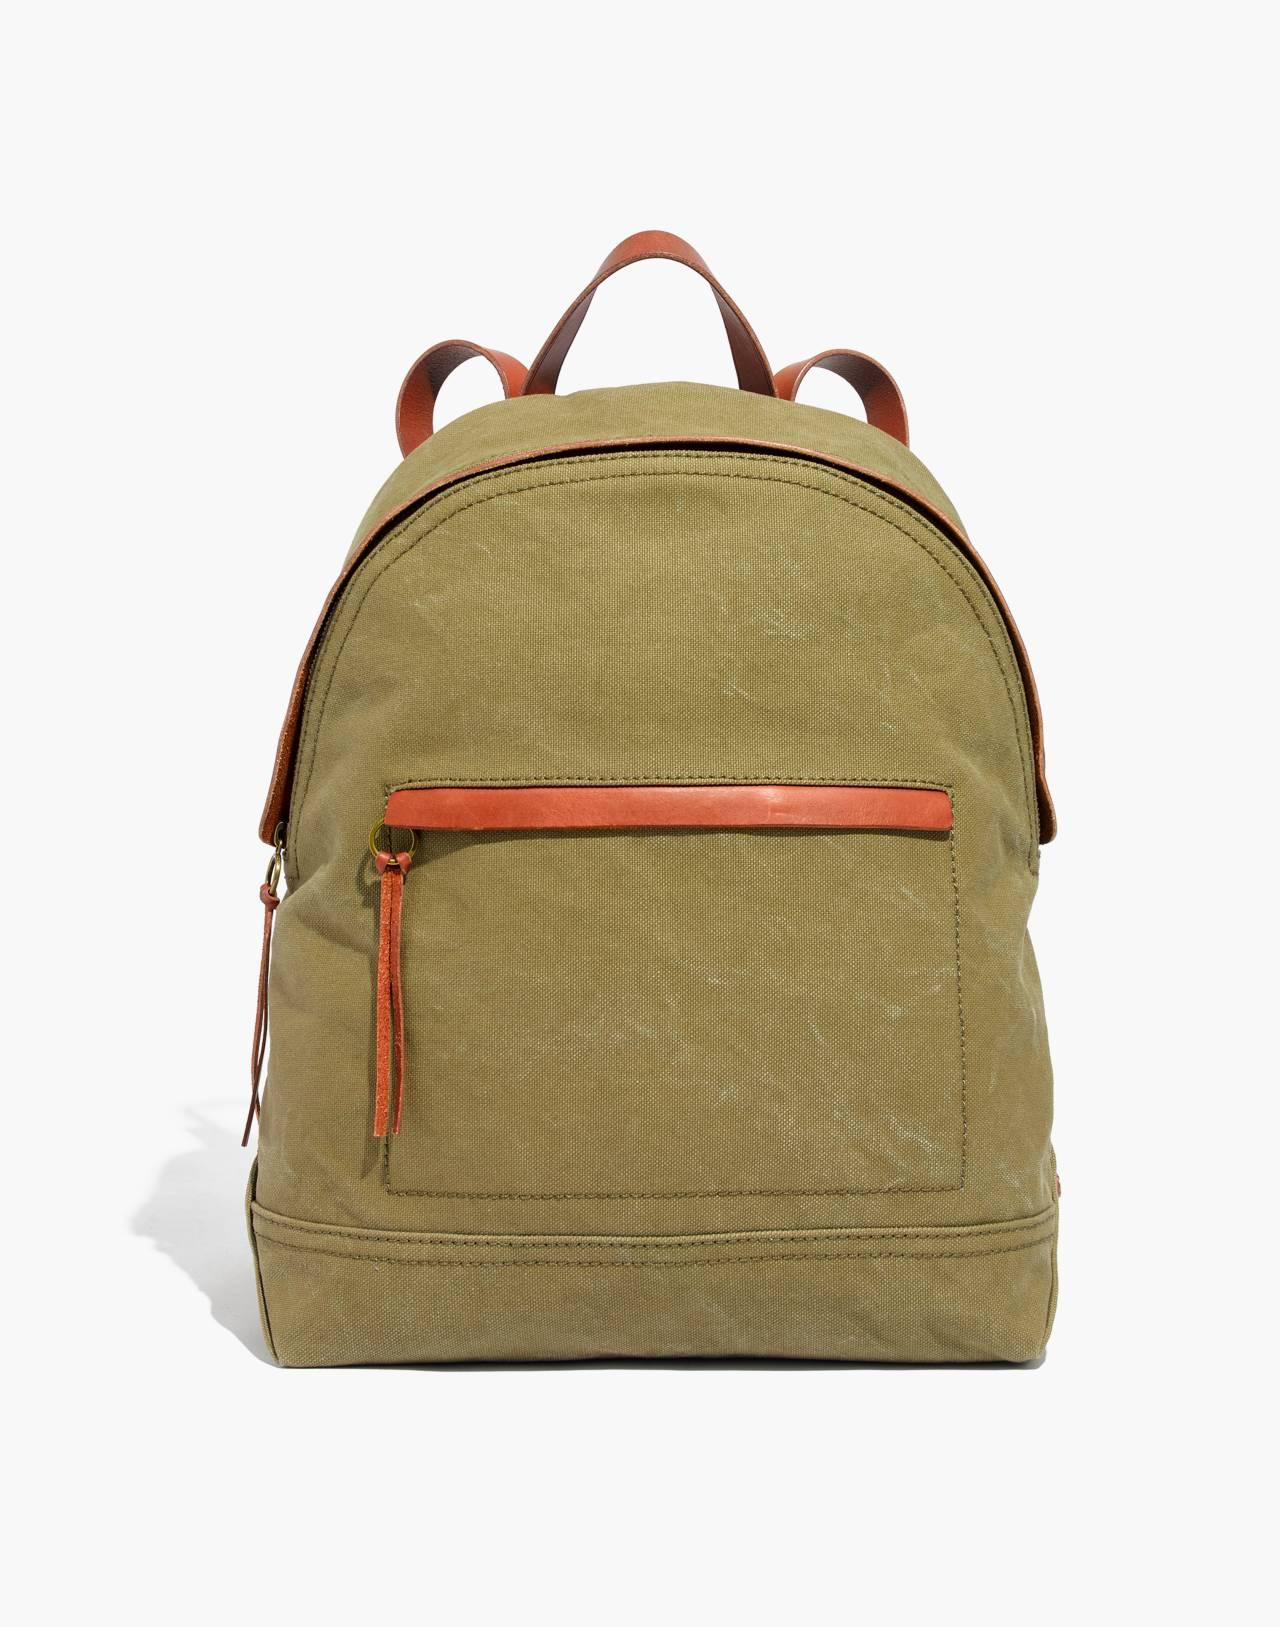 The Charleston Backpack in british surplus image 1